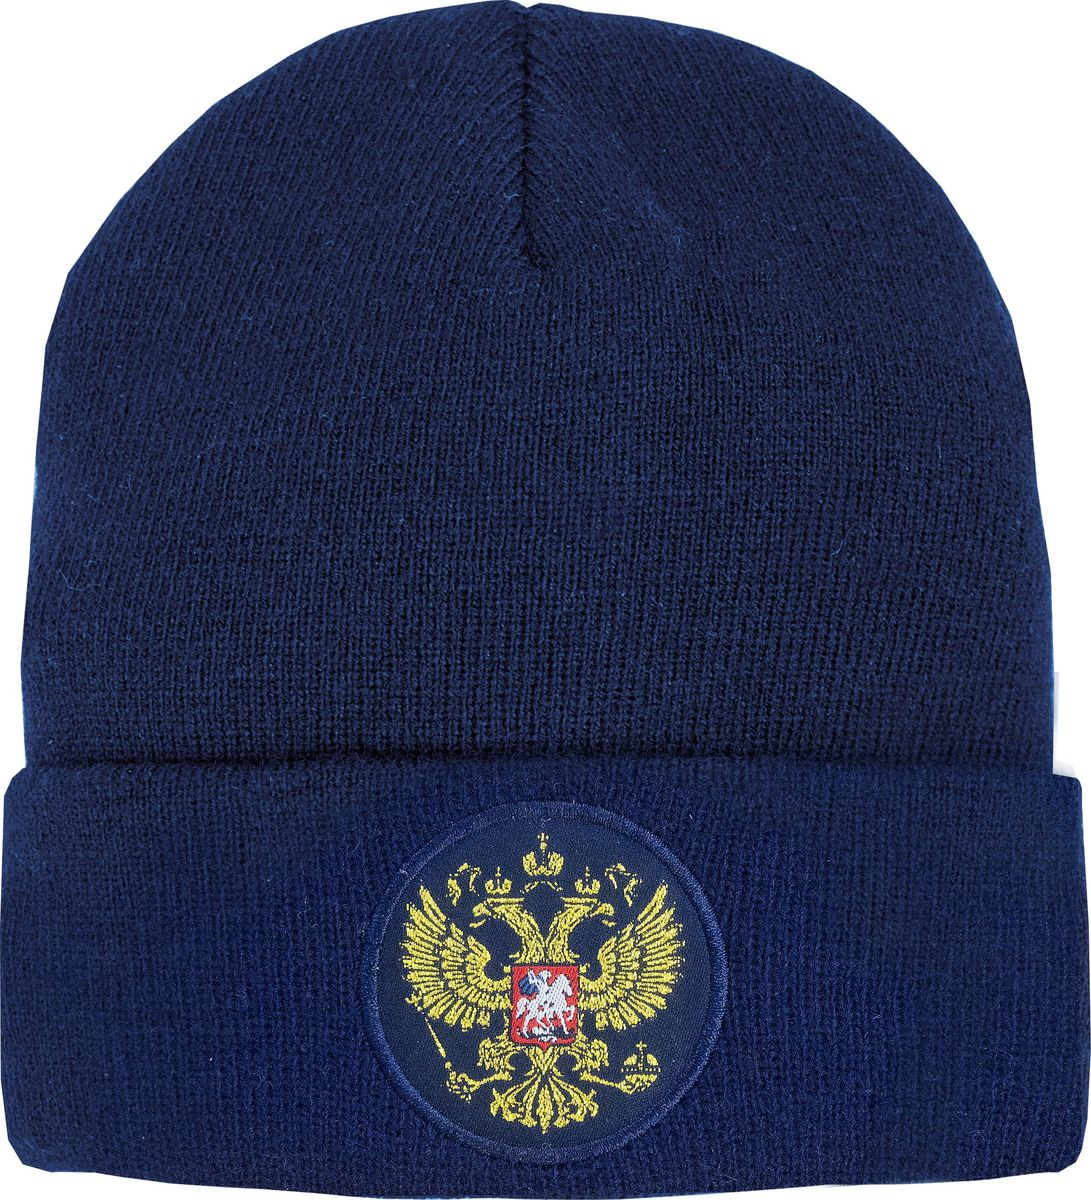 Шапка мужская Atributika & Club Россия, цвет: темно-синий. 11331. Размер 55/5811331